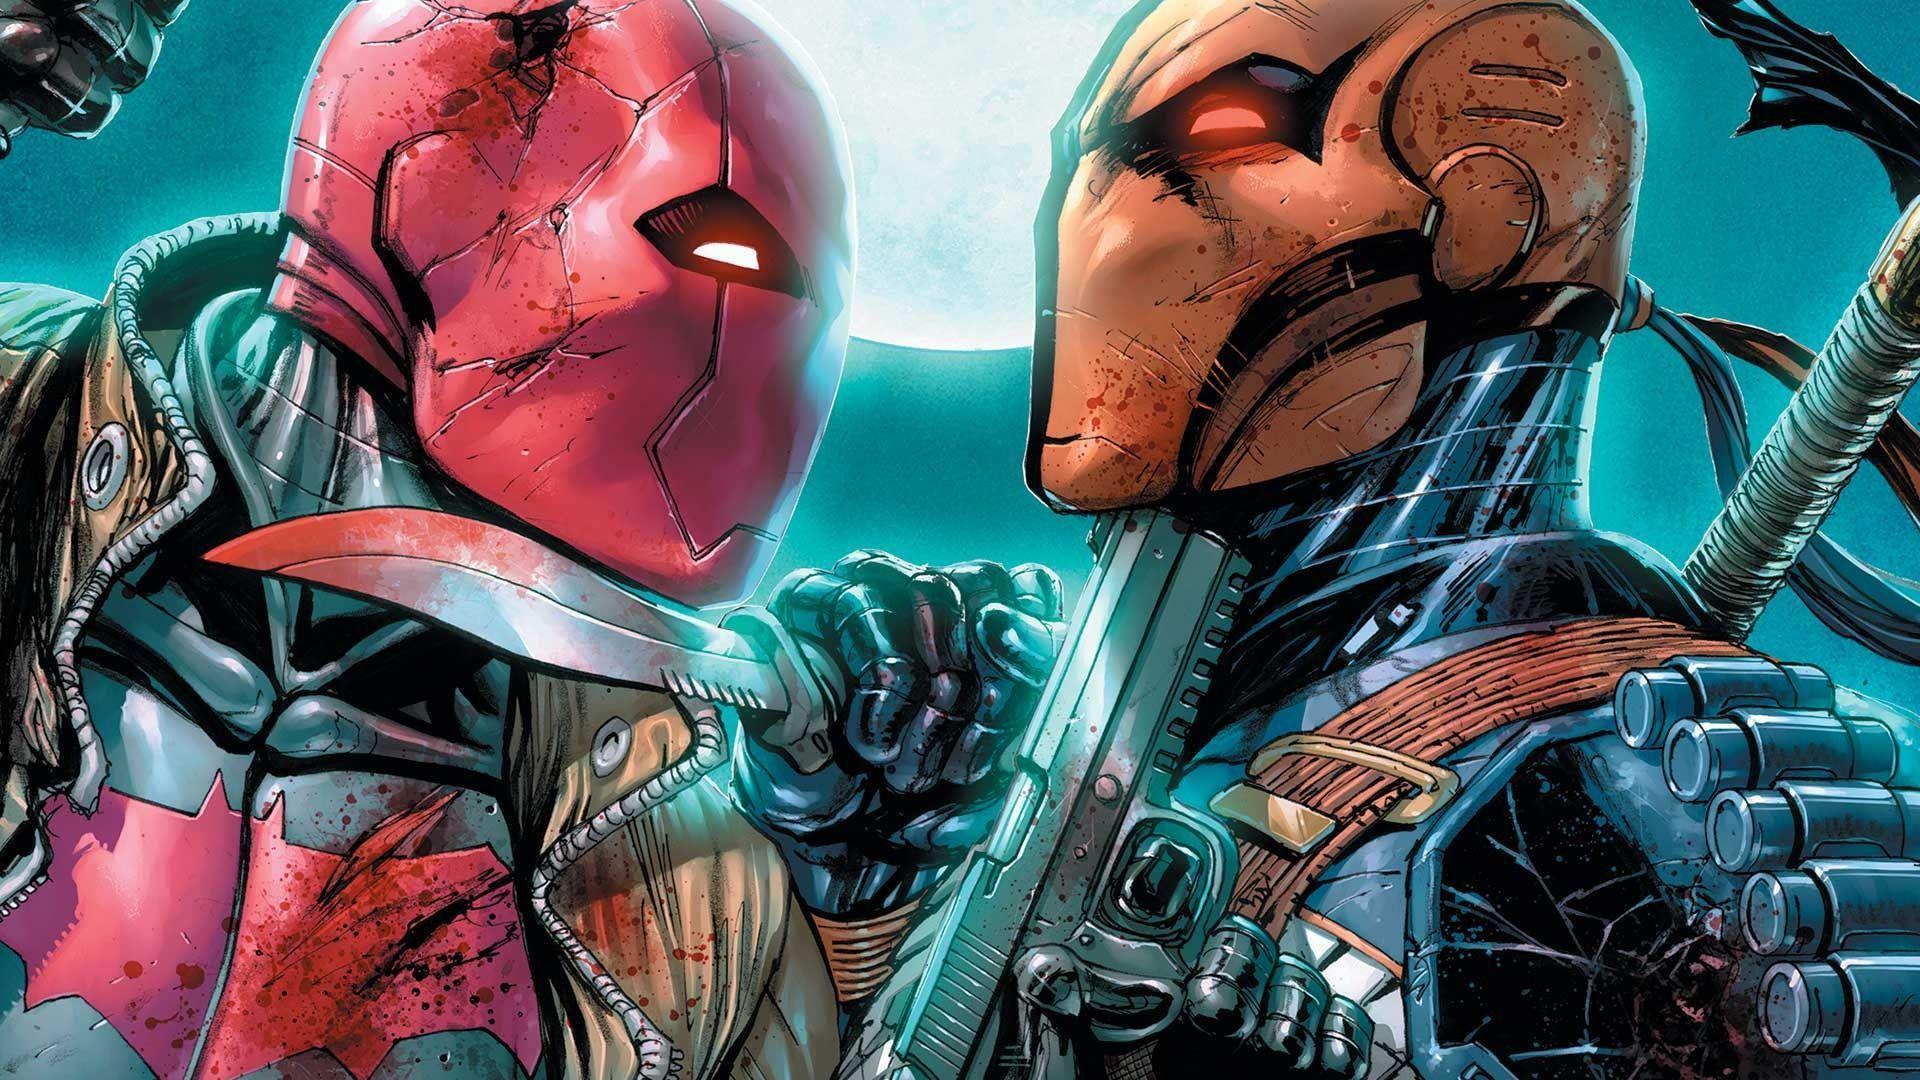 New 52 Deathstroke, Red Hood vs Old Man Logan, X-23 - Battles ...